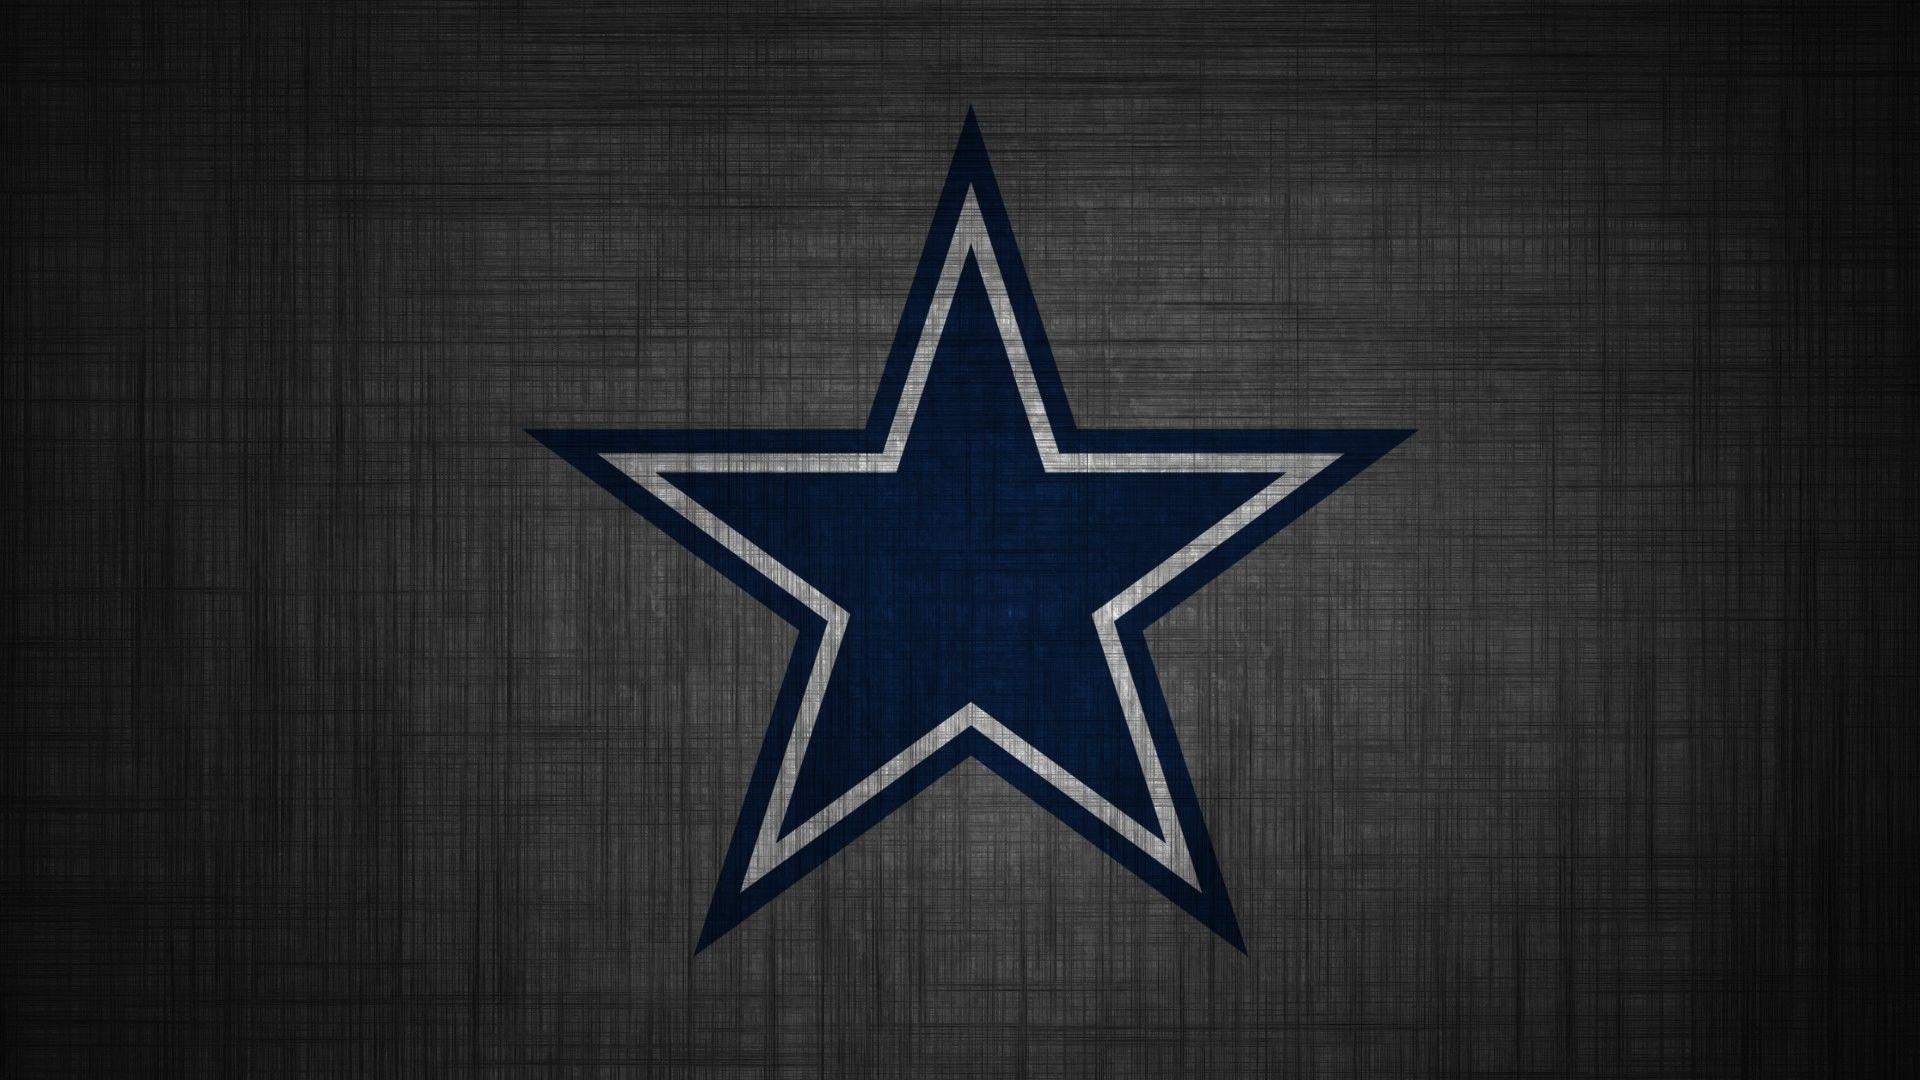 Dallas Cowboys Wallpapers Hd   Data-src /full/629498 - Dallas Cowboys Wallpaper Laptop - HD Wallpaper